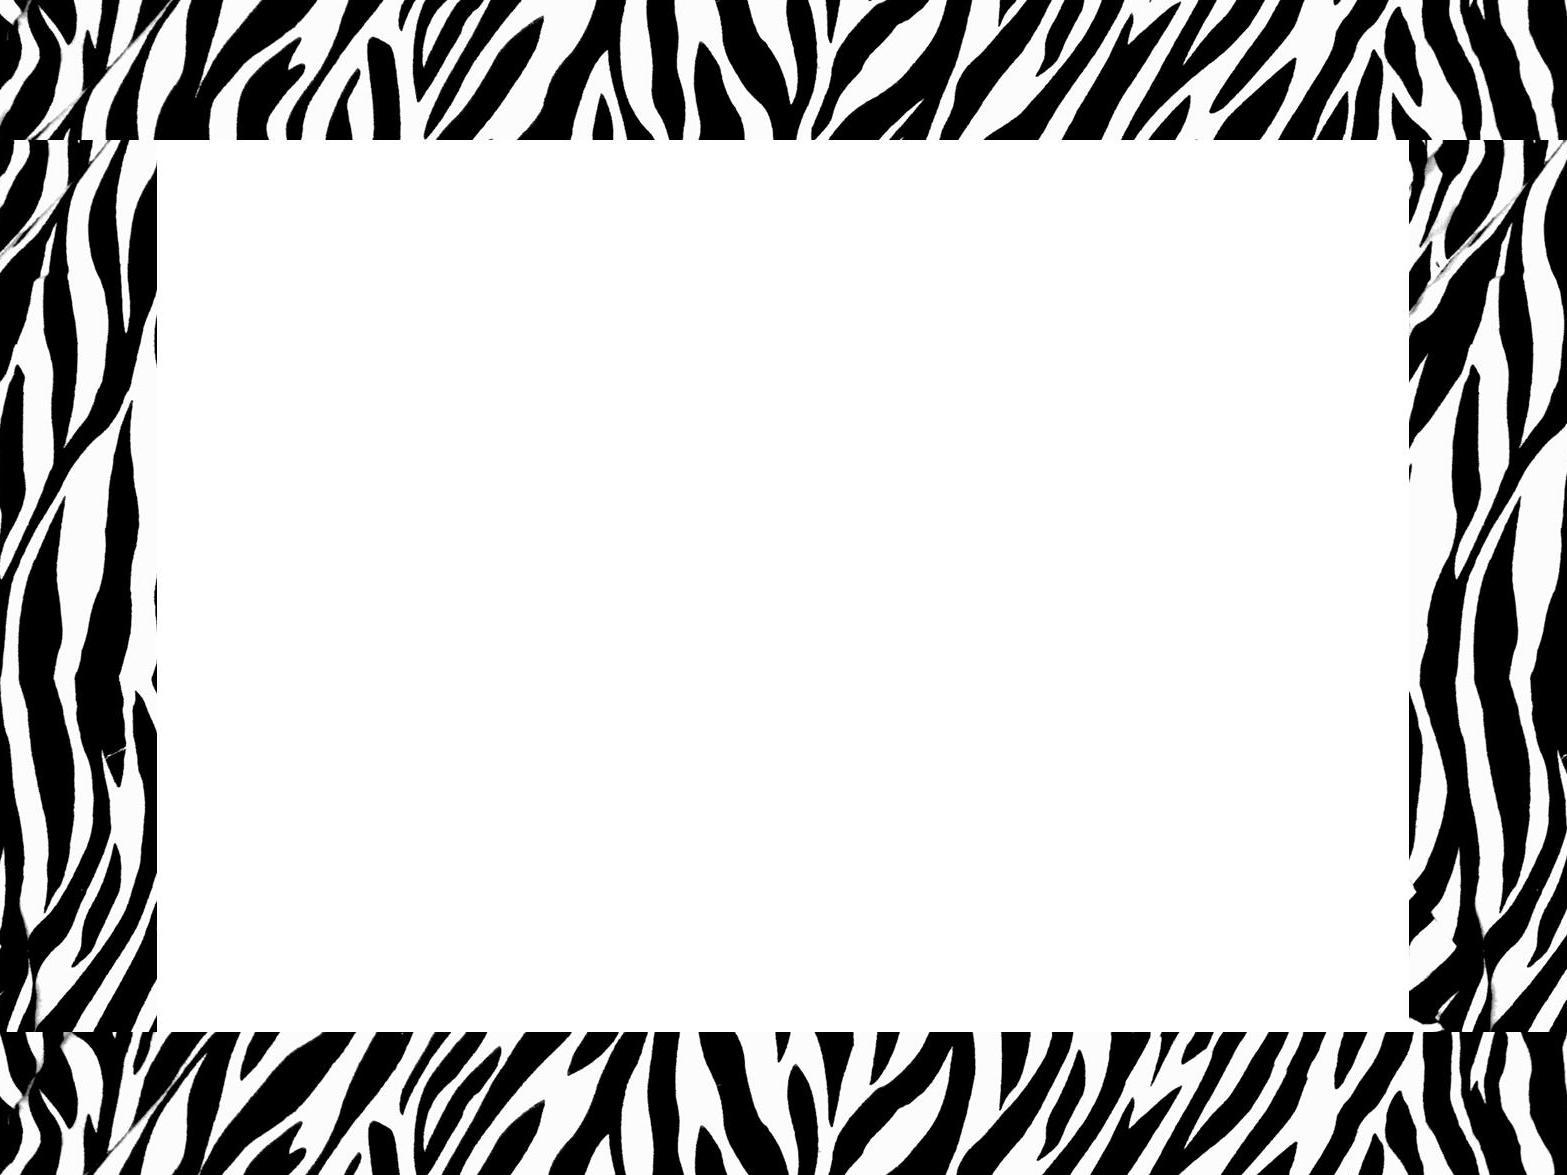 Free Free Zebra Print Border, Download Free Clip Art, Free Clip Art - Free Printable Zebra Print Birthday Invitations